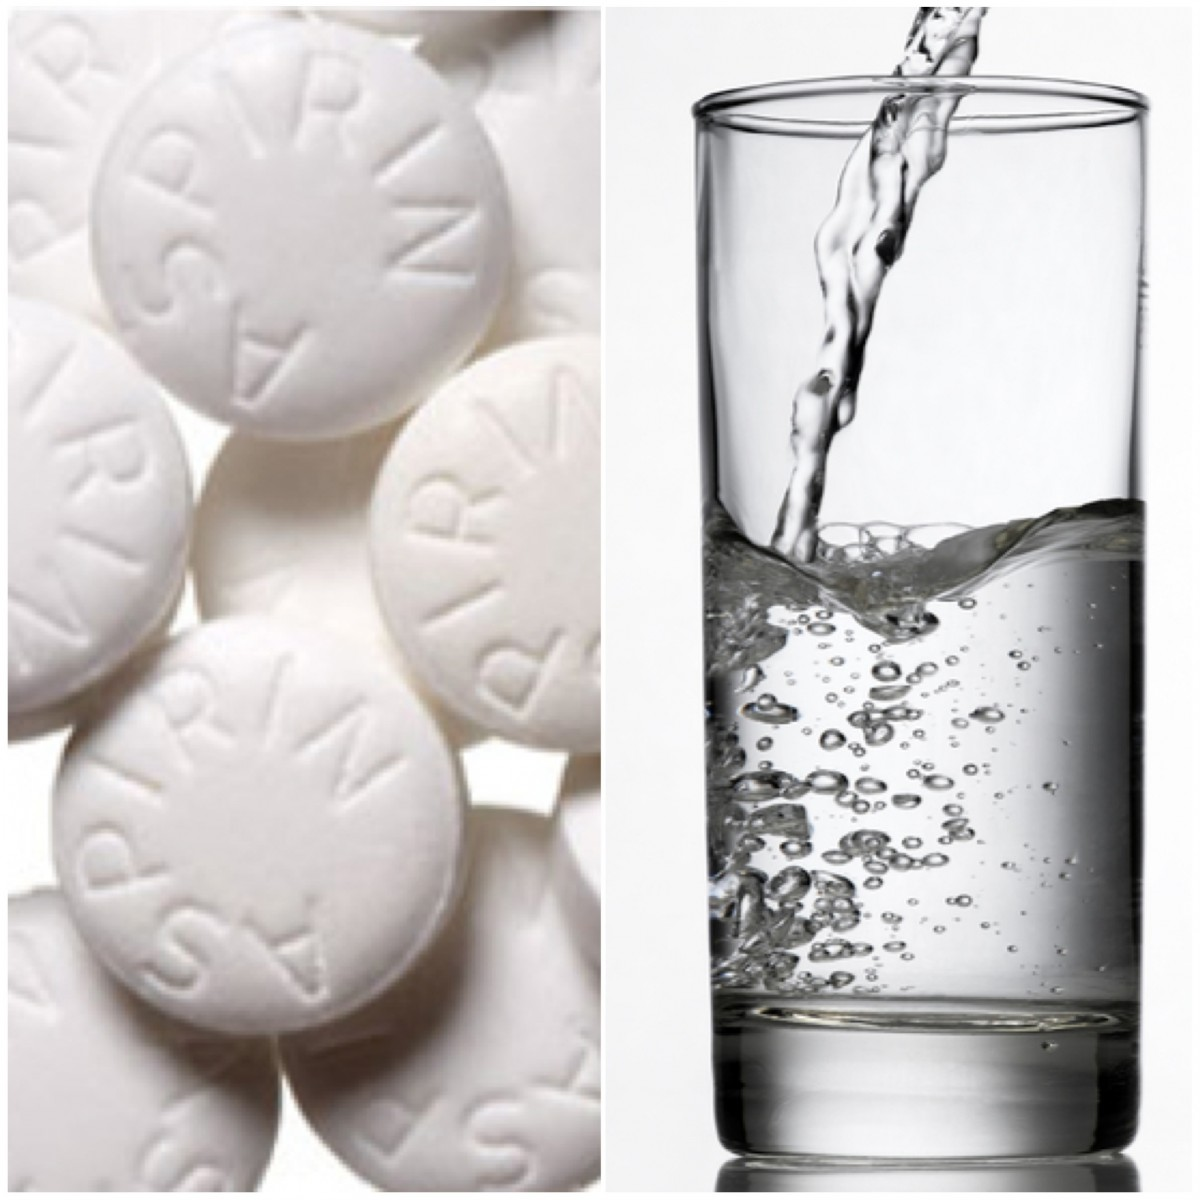 aspirin_acne_mask1